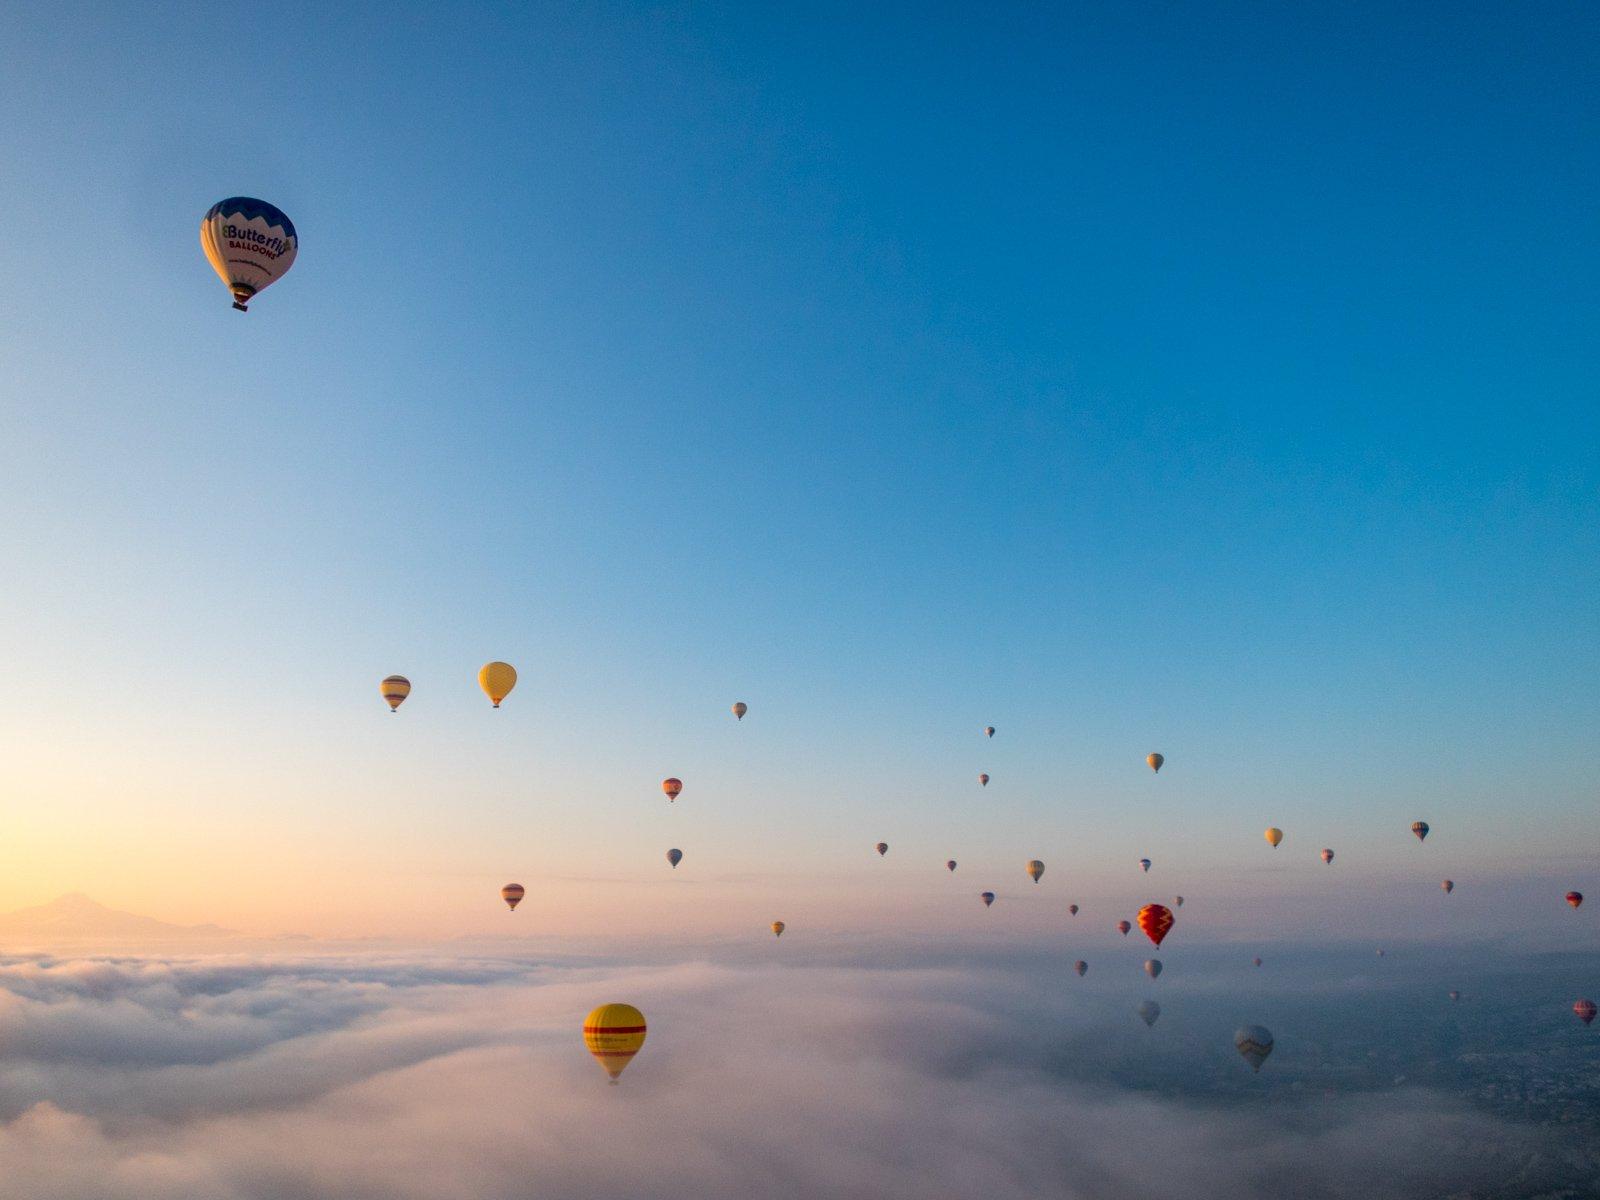 Cappadocia hot air balloon rides at sunrise